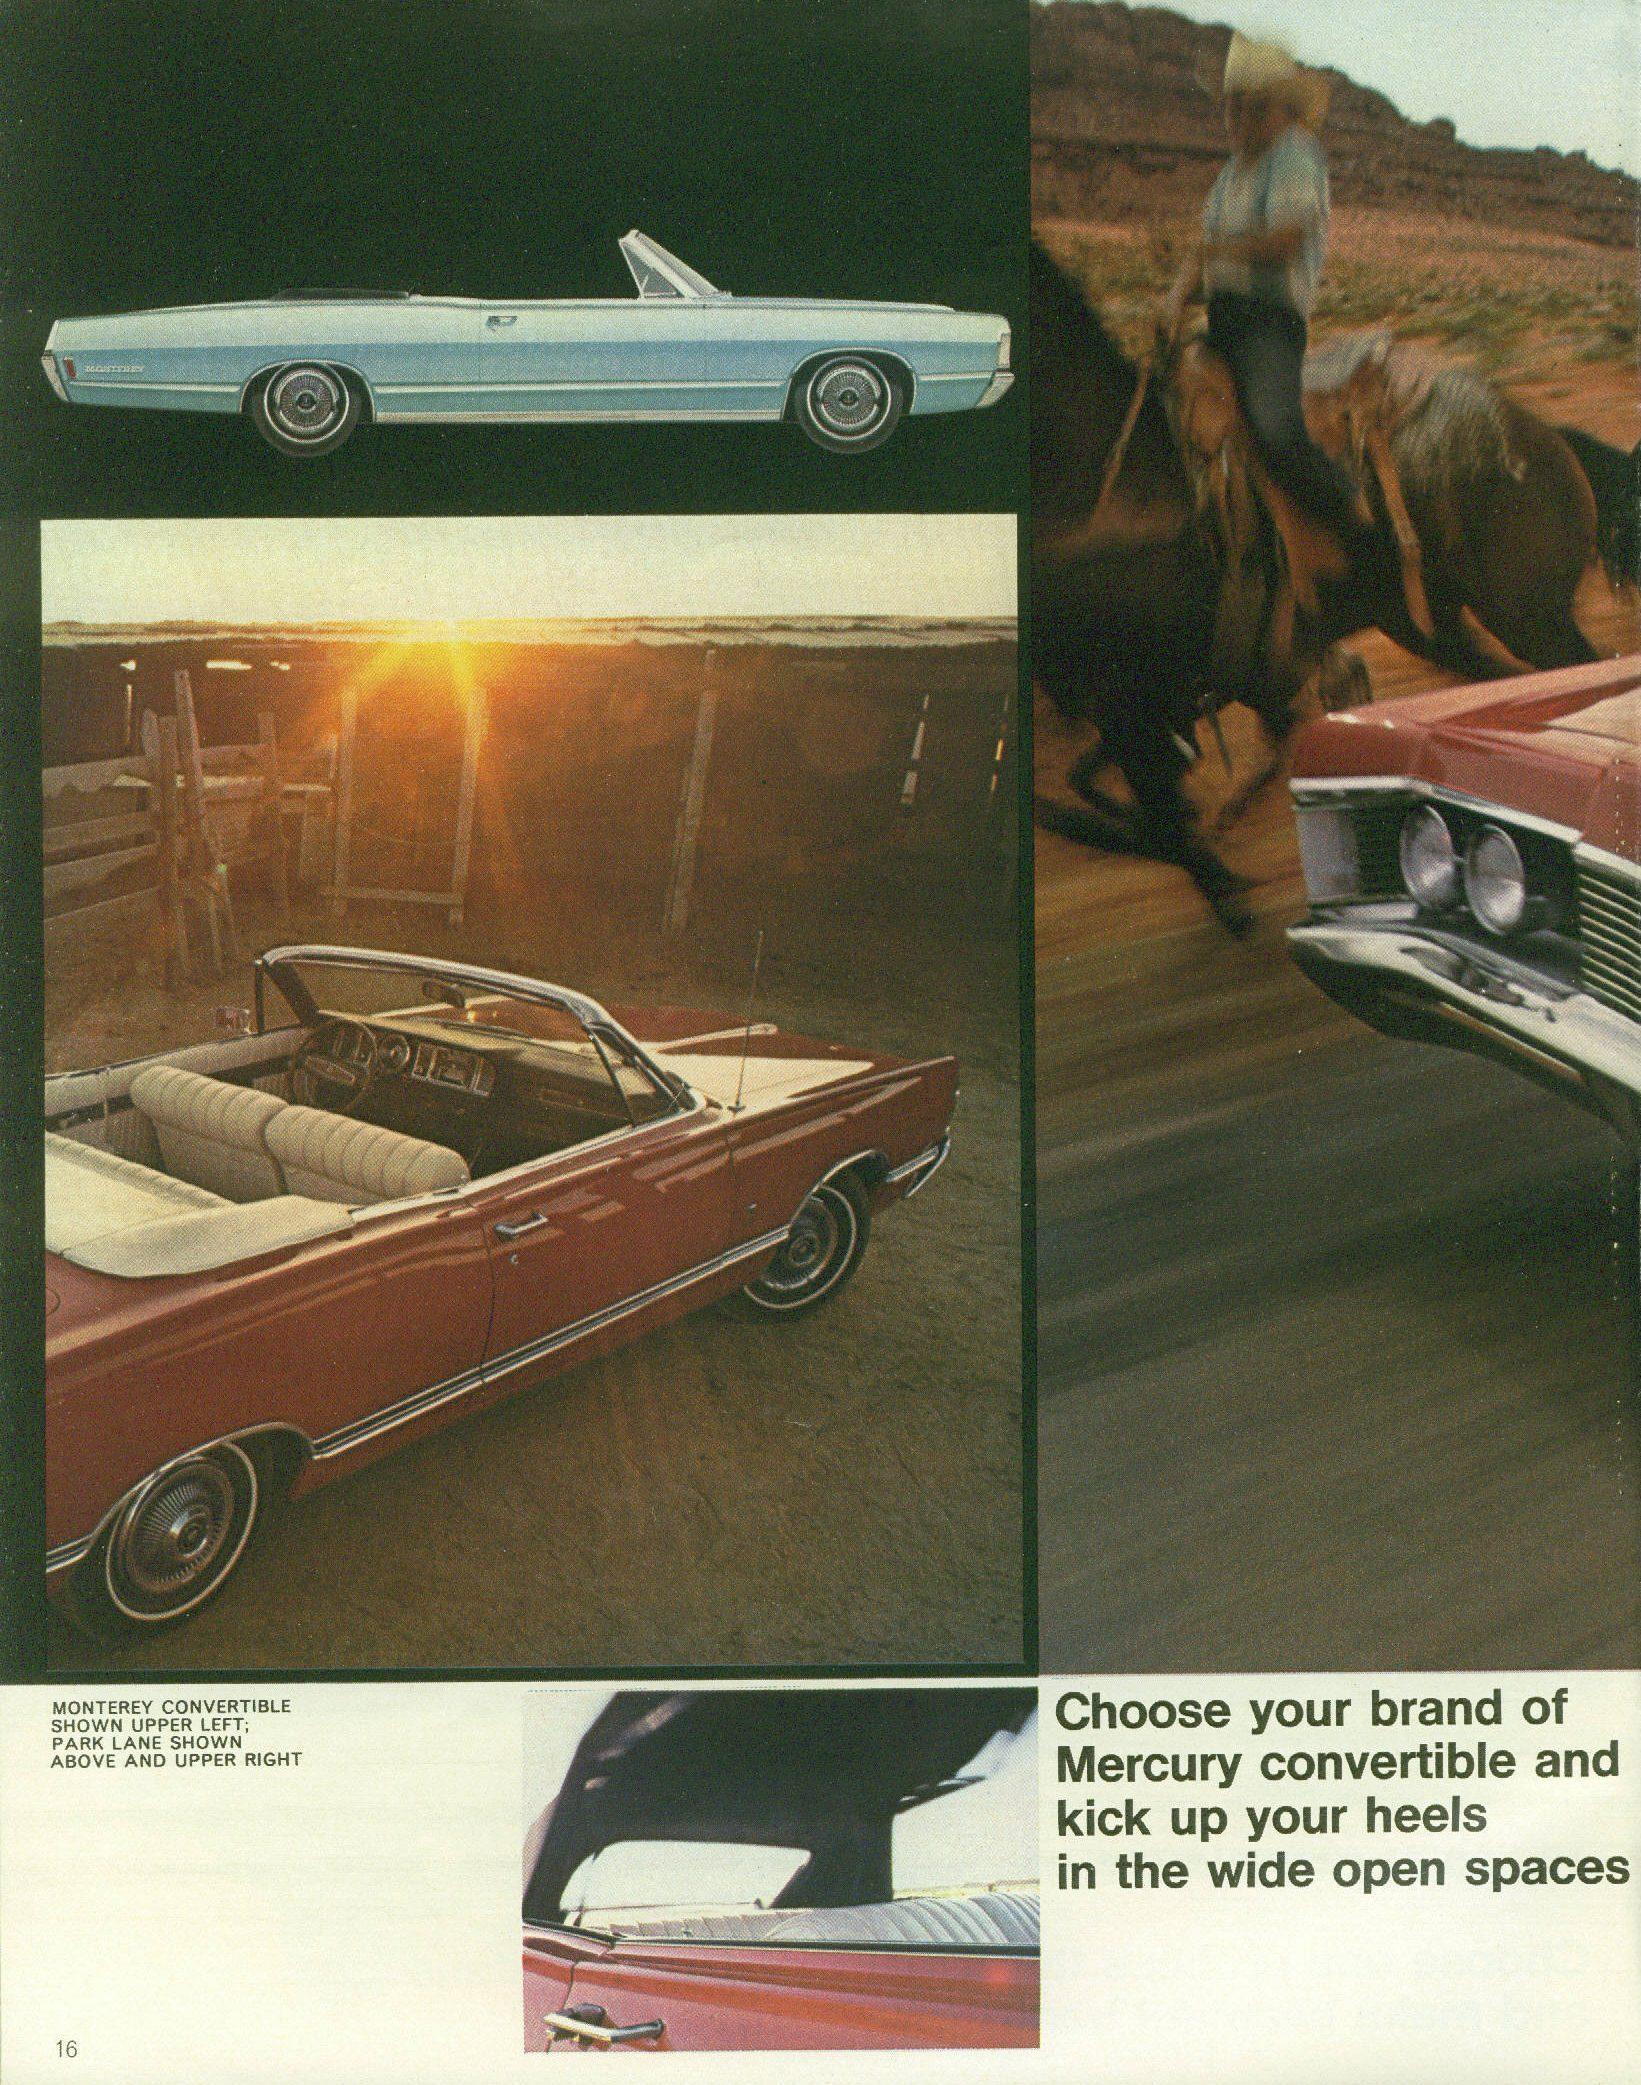 1968 Mercury full size sedan brochure left